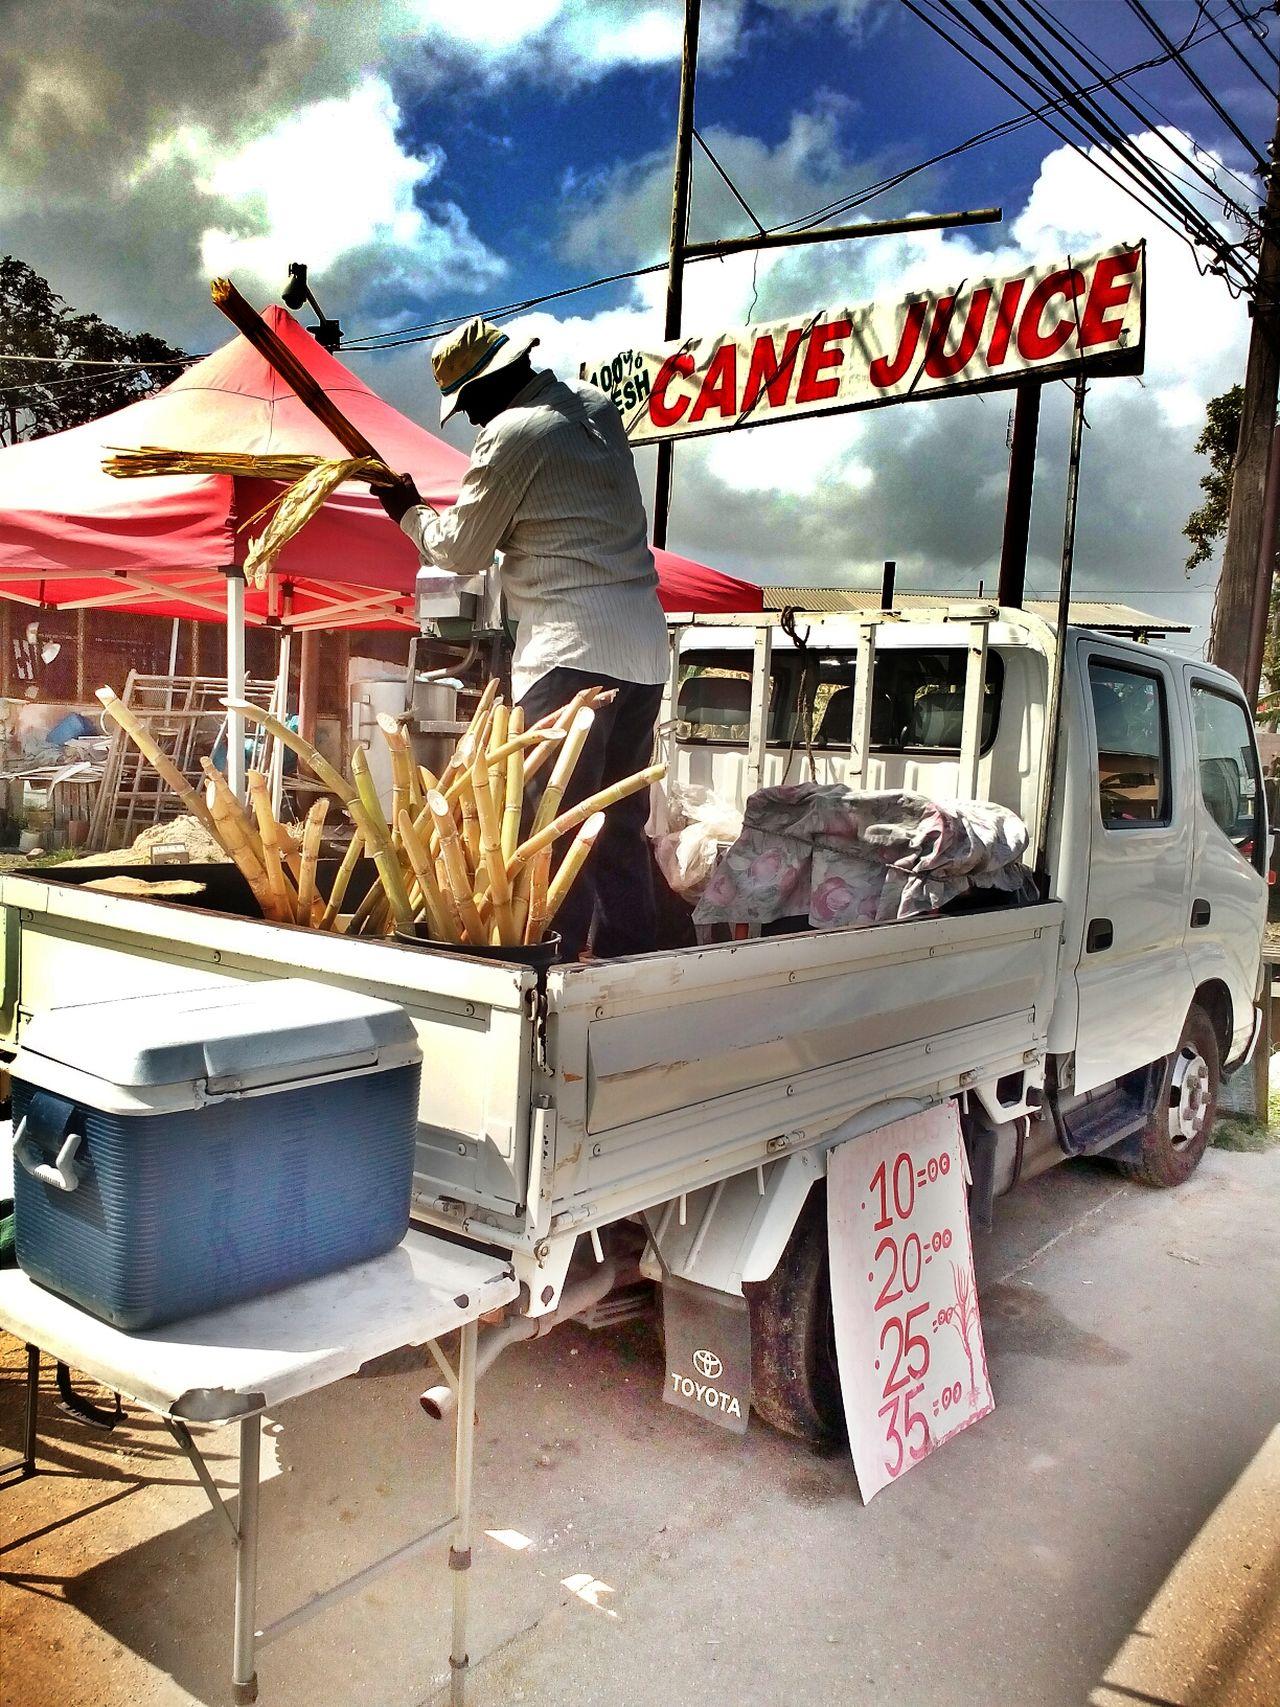 Sugarcane juice Sugarcanejuice Sugarcanepress Vendor's Cart Vendors On Wheels Trinidad And Tobago